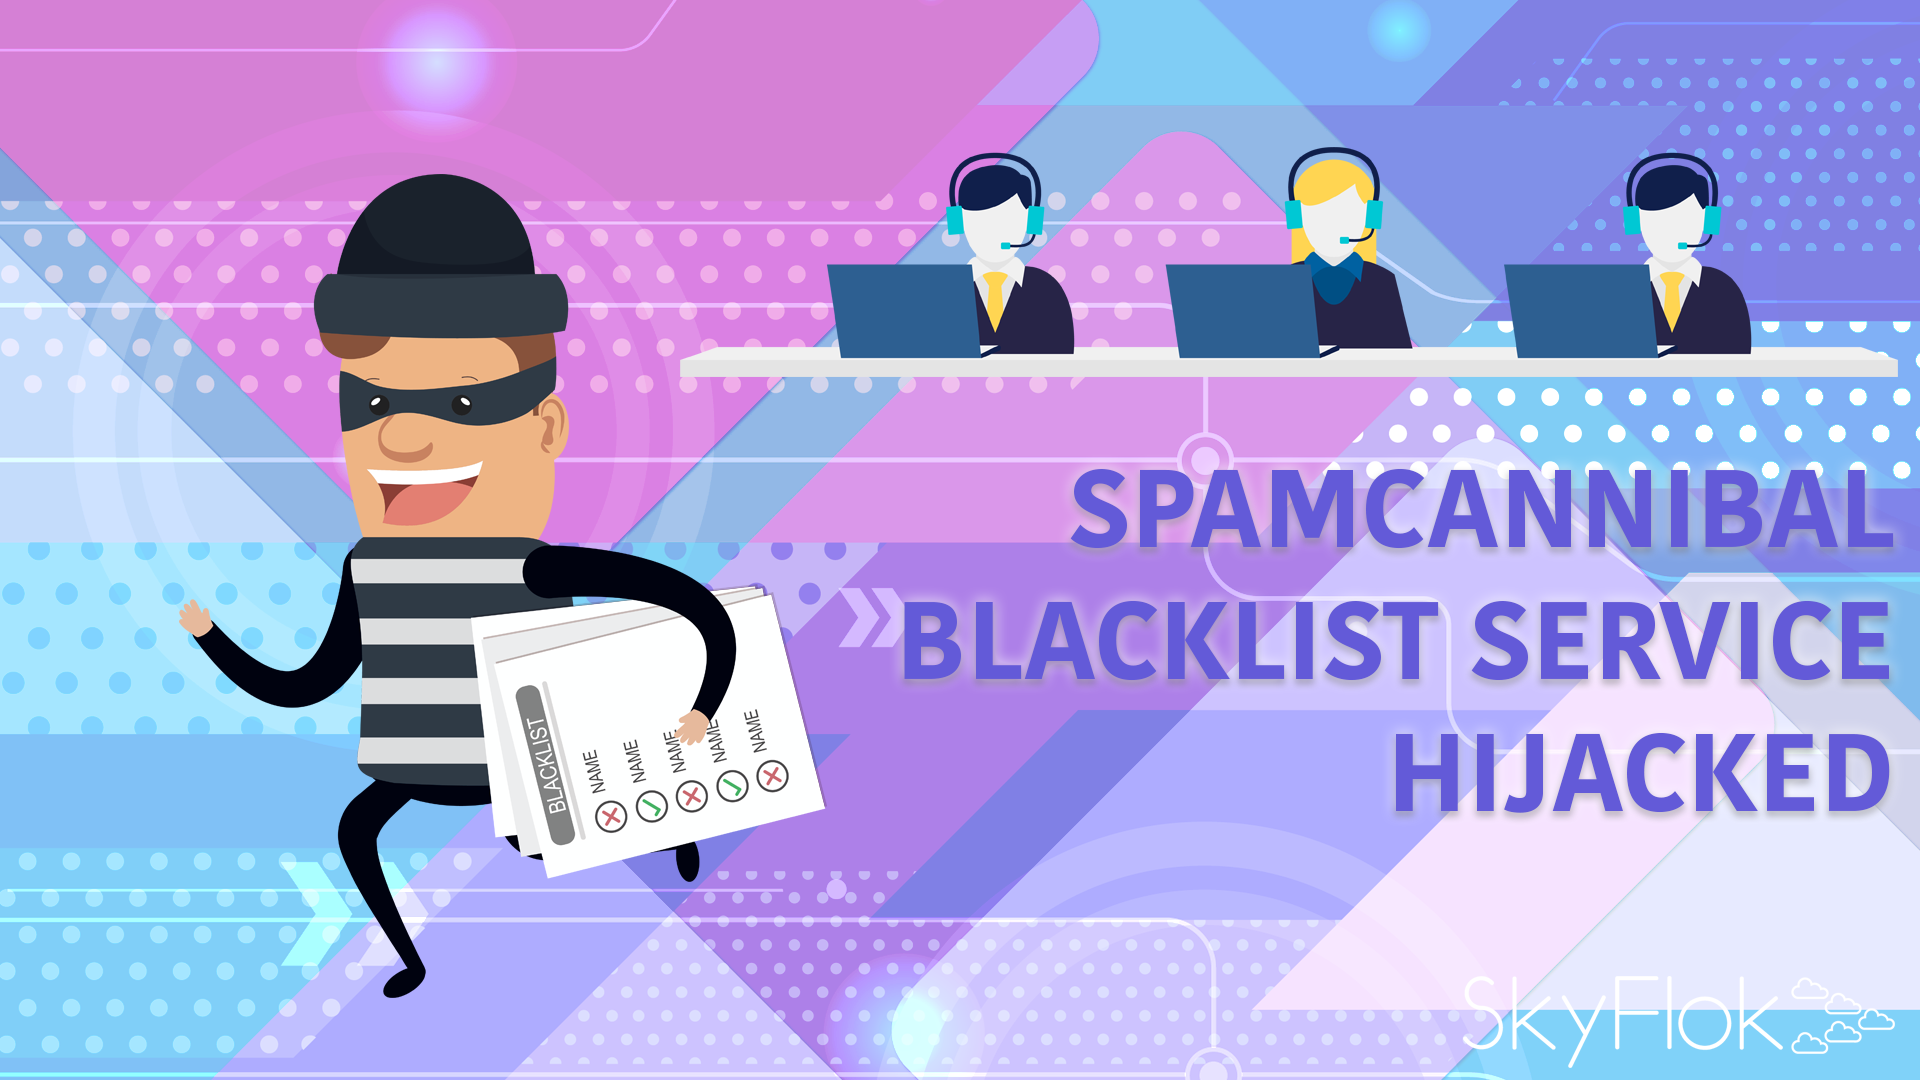 SpamCannibal blacklist service hijacked